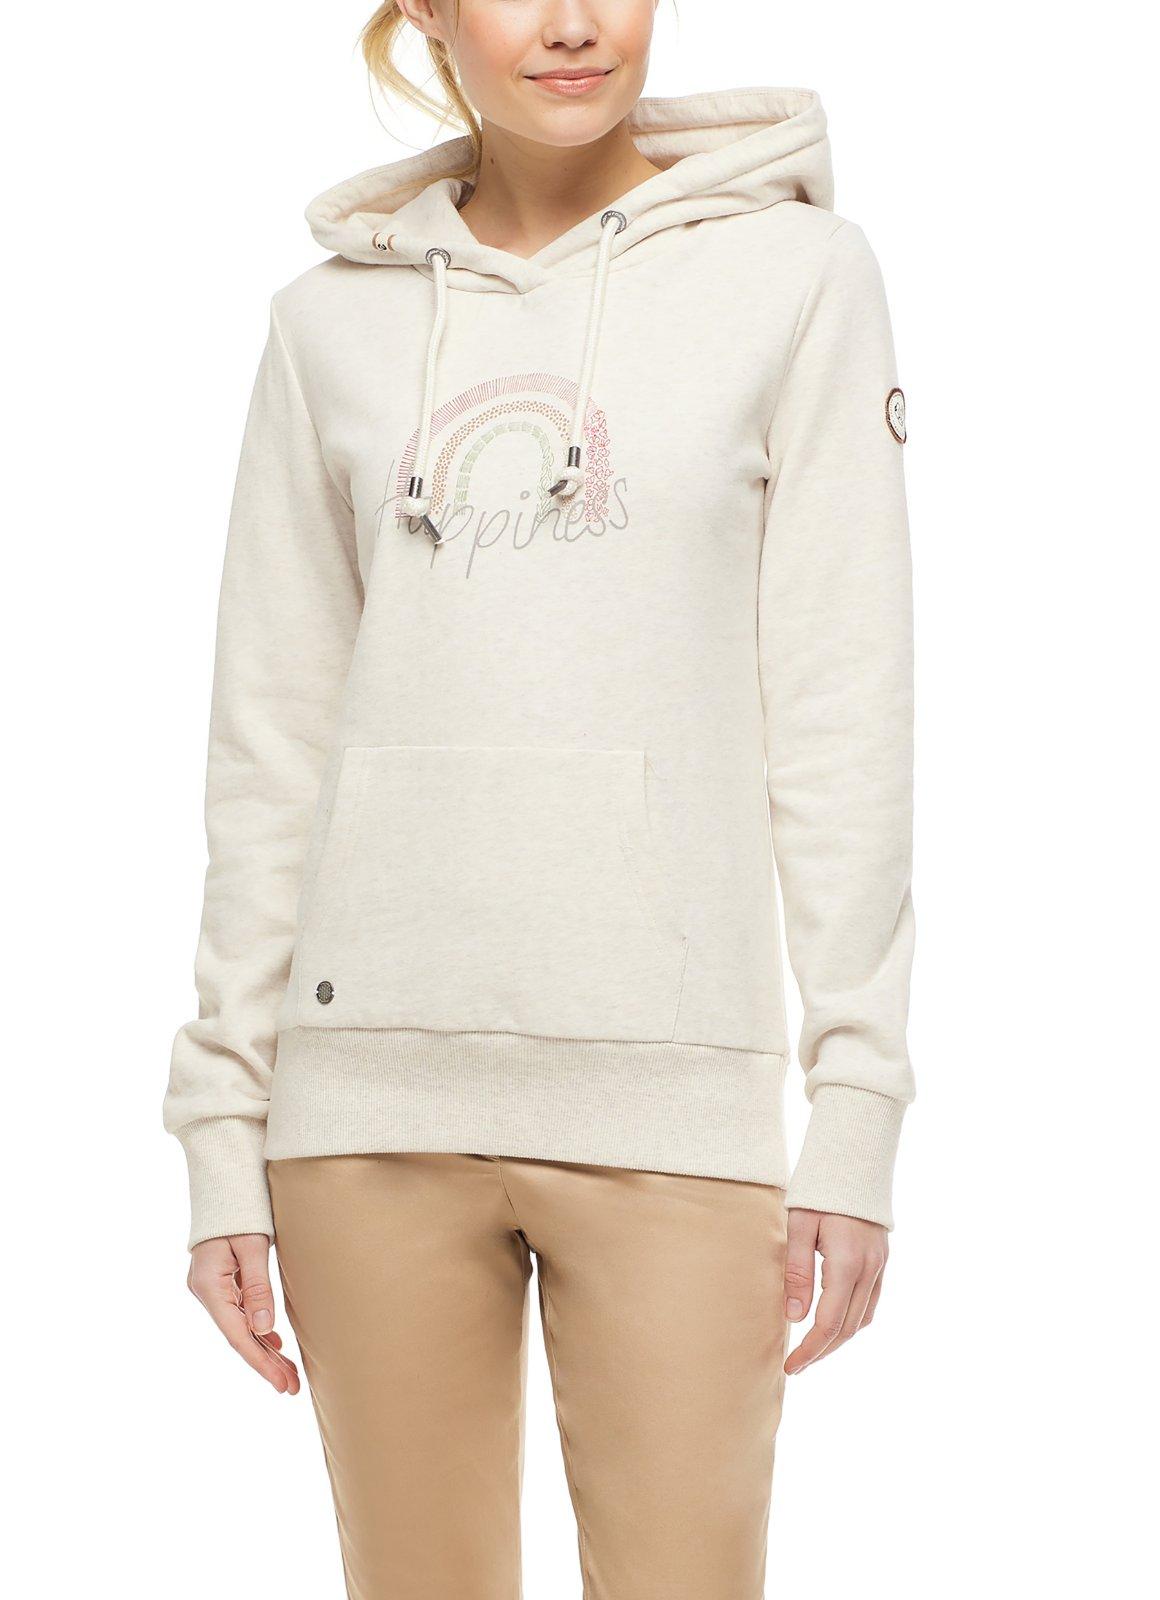 RAGWEAR-BERIT-ORGANIC-Sweatshirt-Pullover-beige